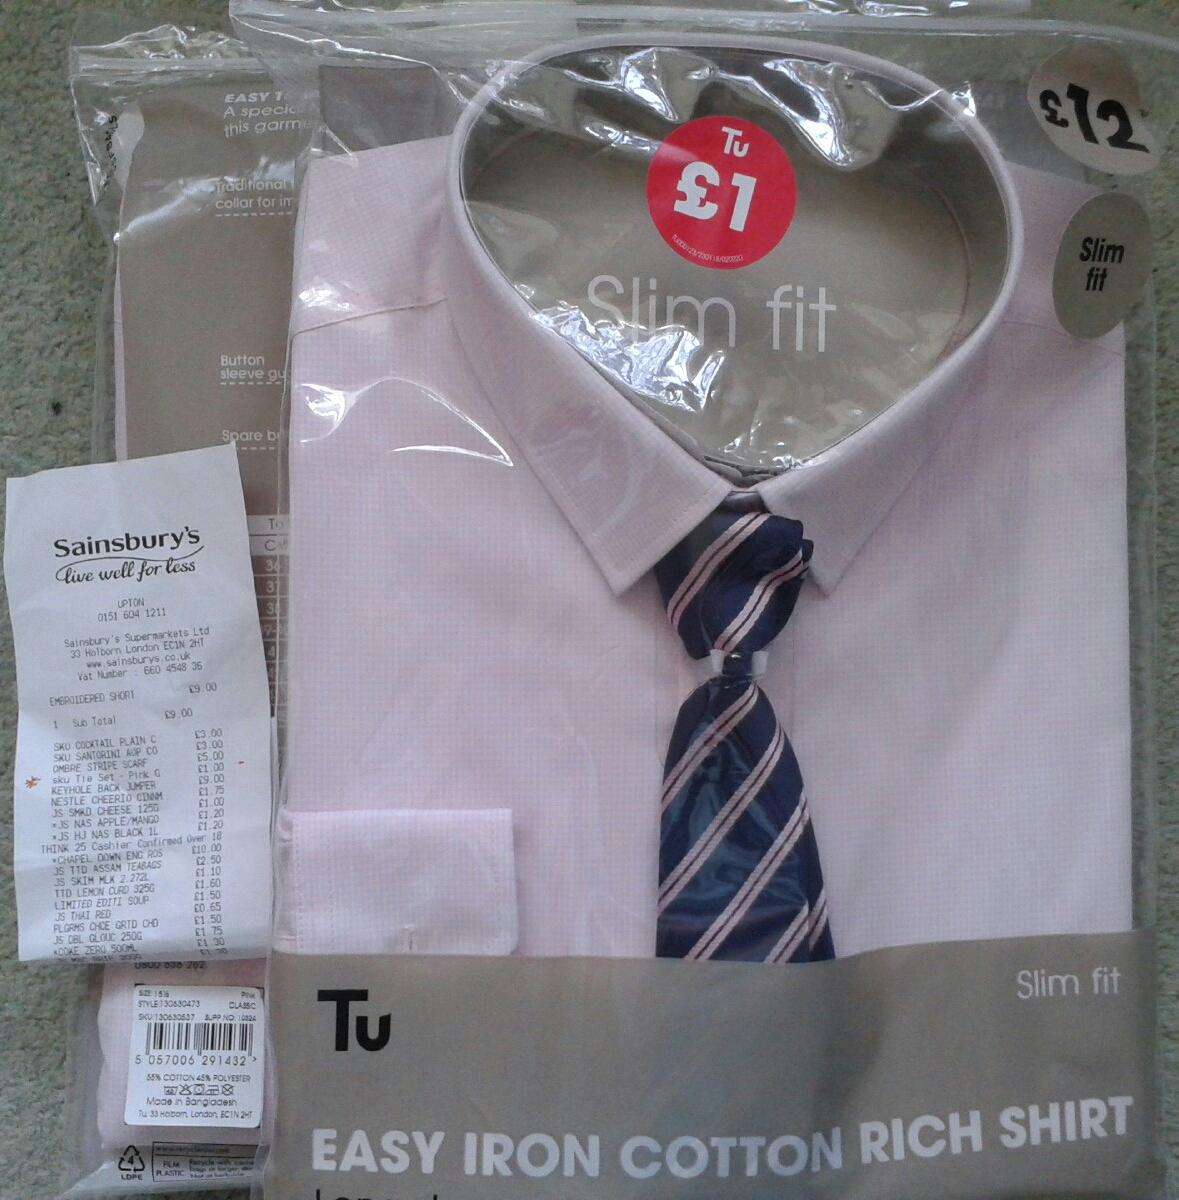 Tu Men's Slim Fit Long sleeve 'Cotton Rich'  Shirt & Tie set £1, in-store at Sainsbury's, Upton.